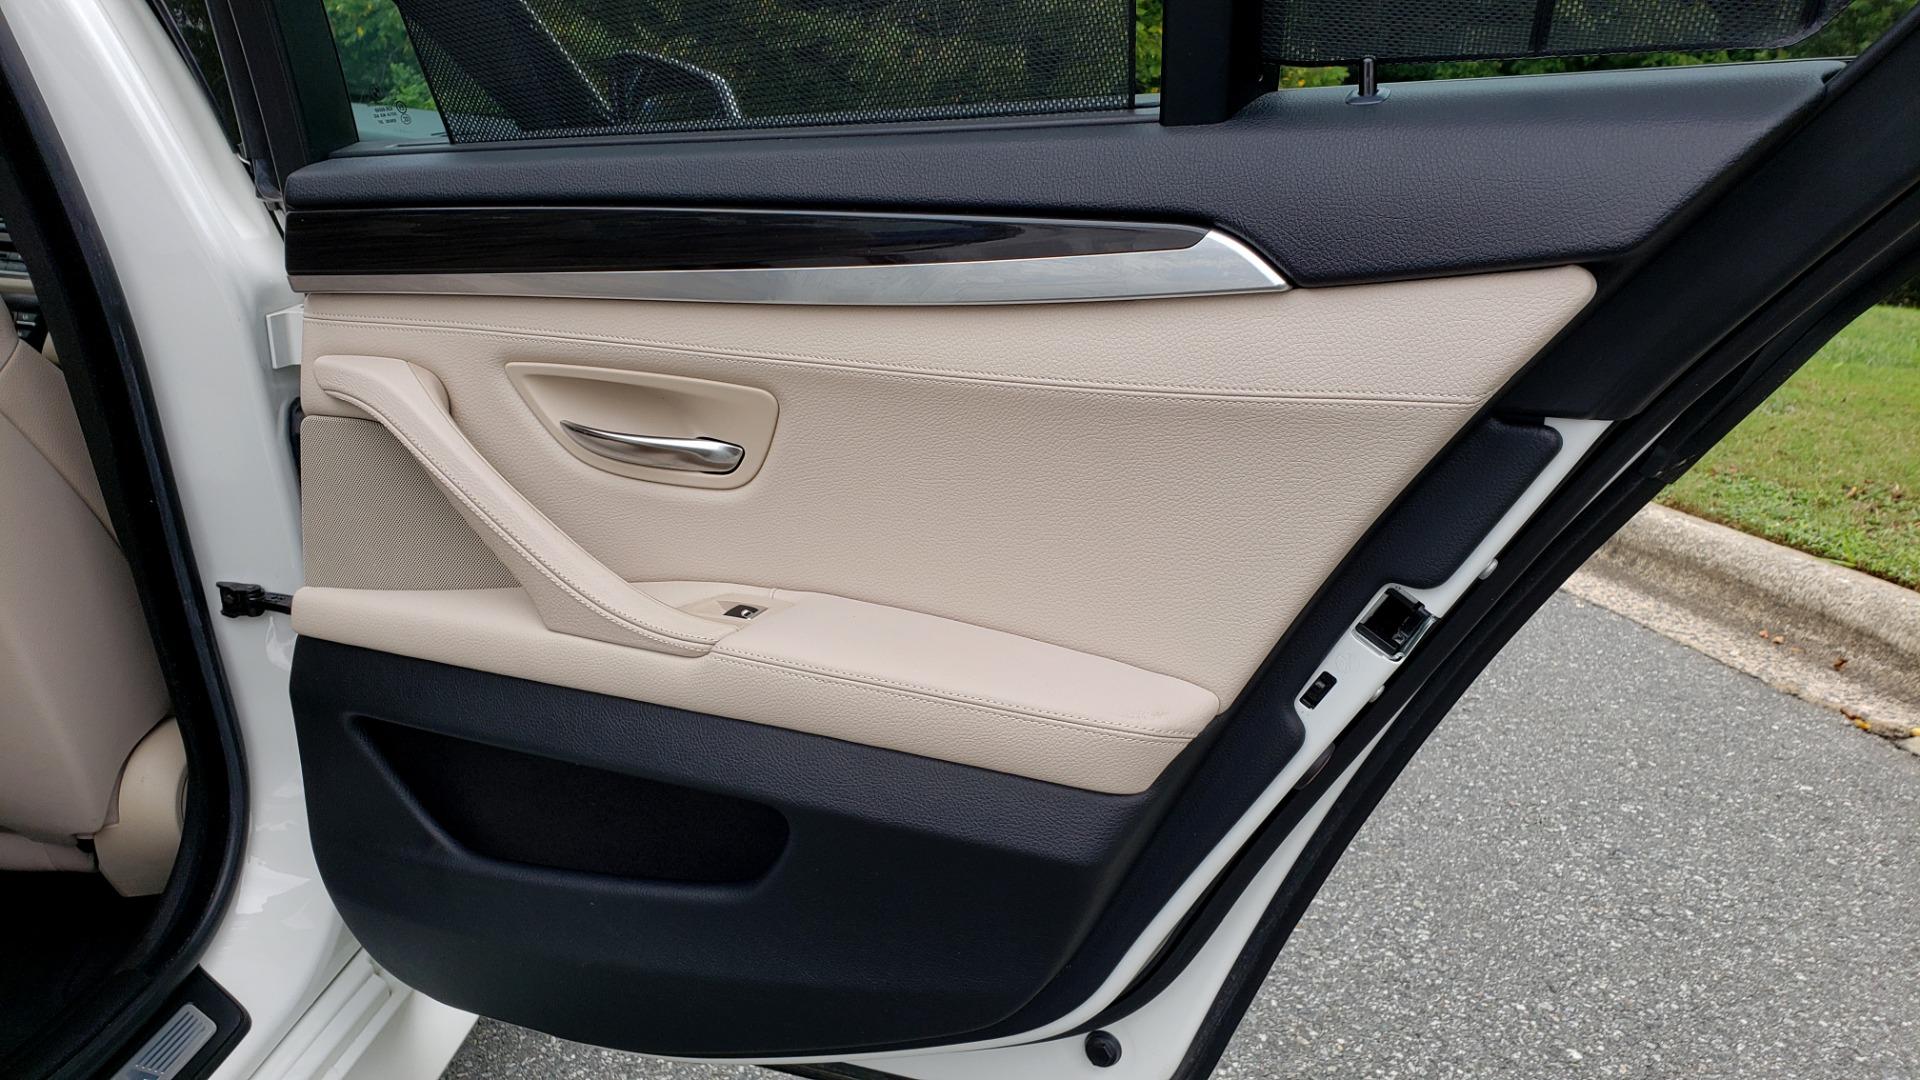 Used 2012 BMW 5 SERIES 550I M SPORT / NAV / CONV PKG / SUNROOF / PREM SND / REARVIEW for sale Sold at Formula Imports in Charlotte NC 28227 58